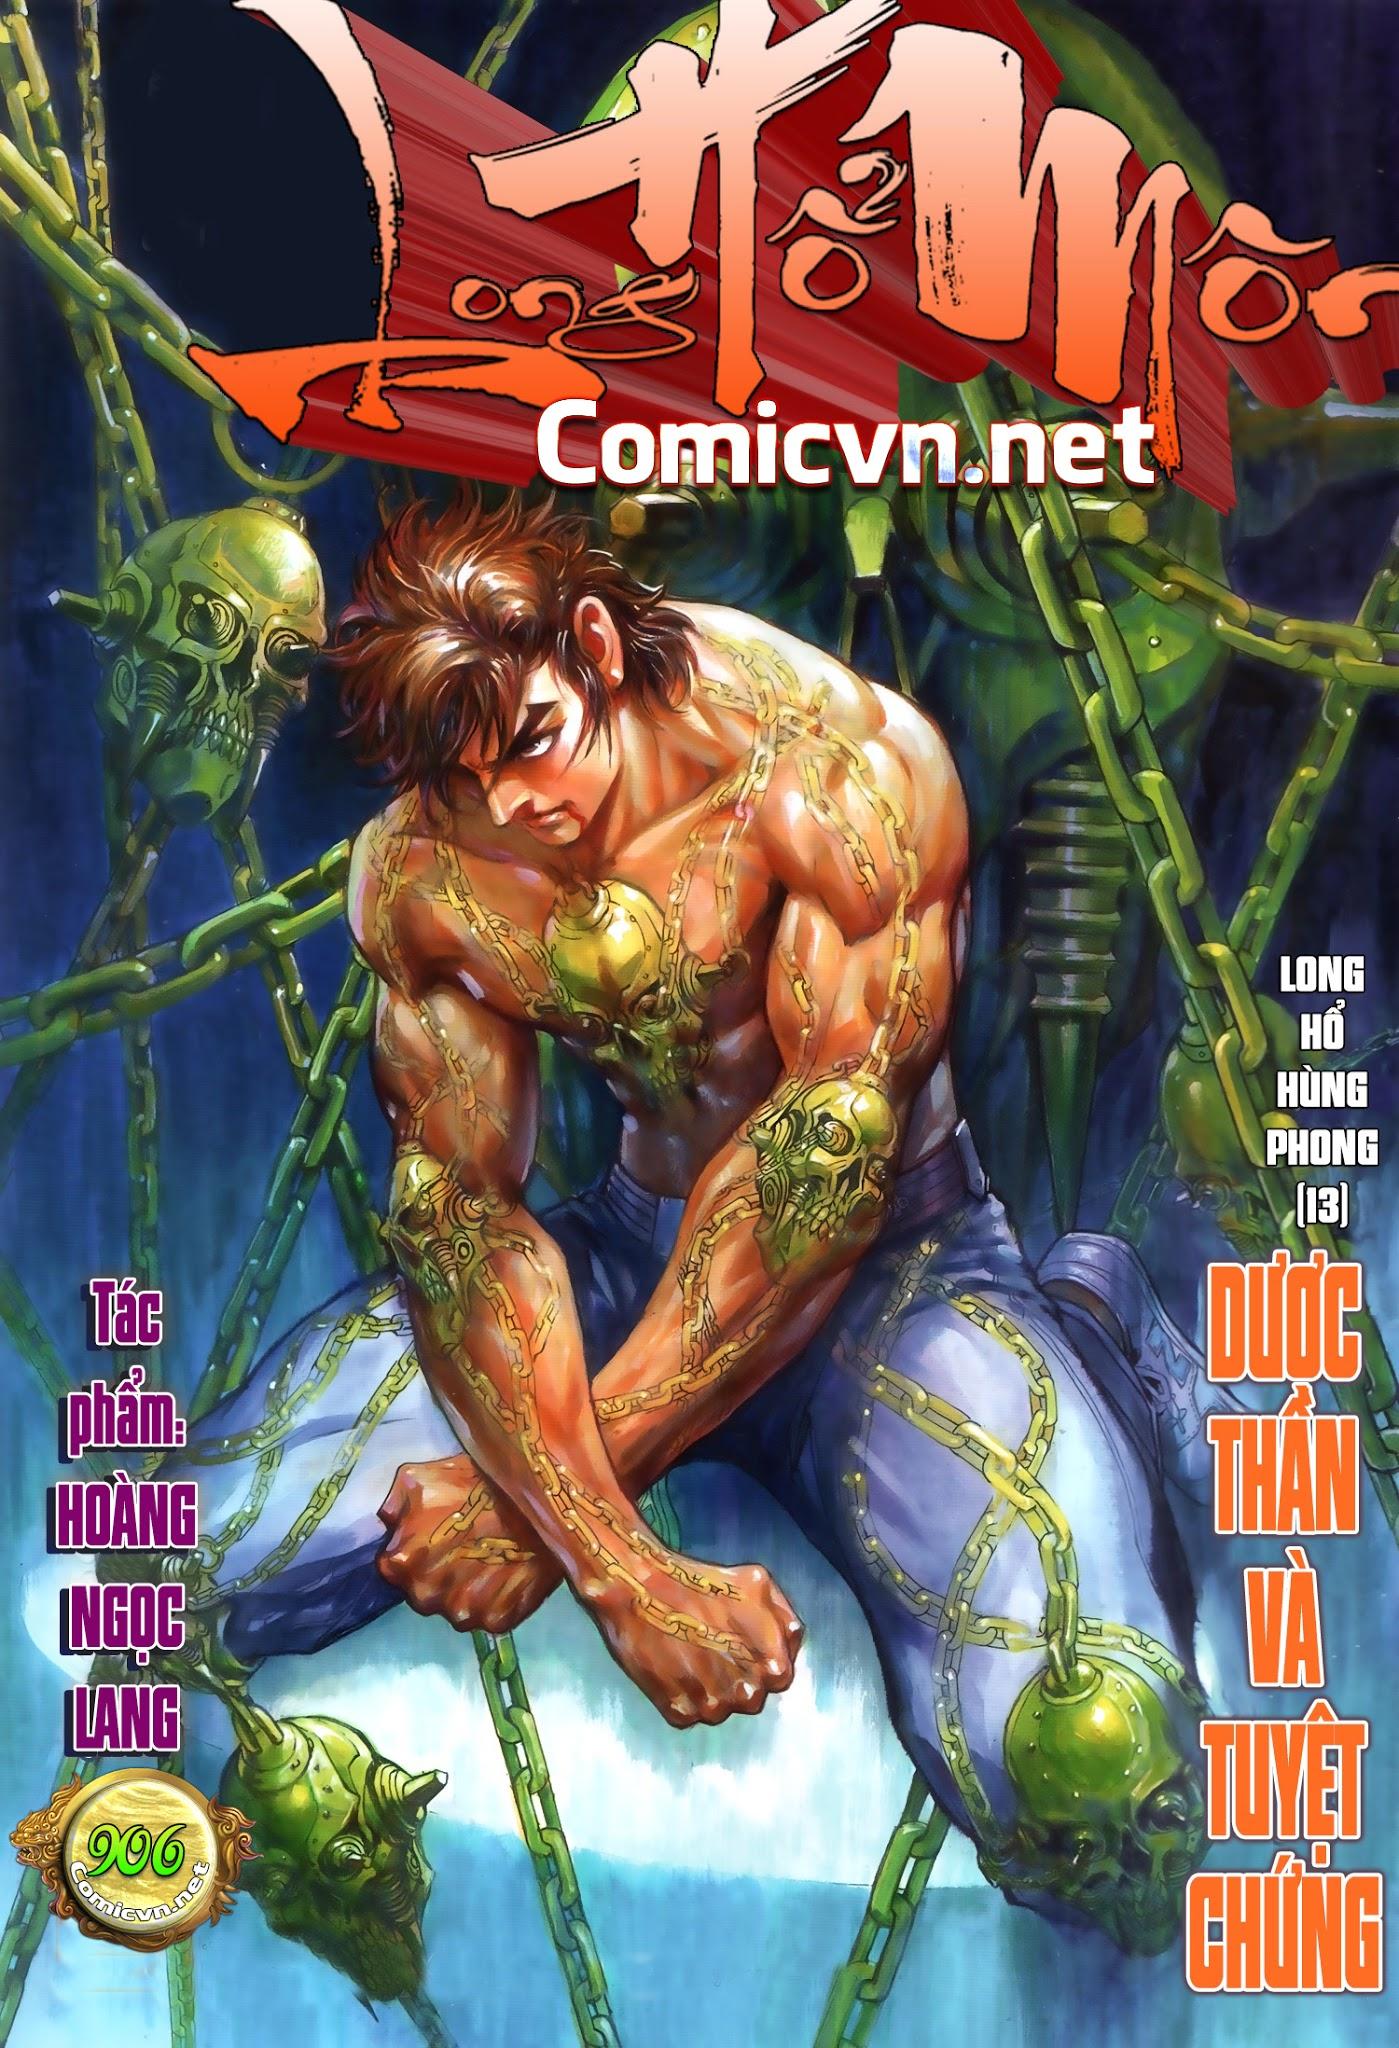 Comicvn.net%2bonly%2b00001